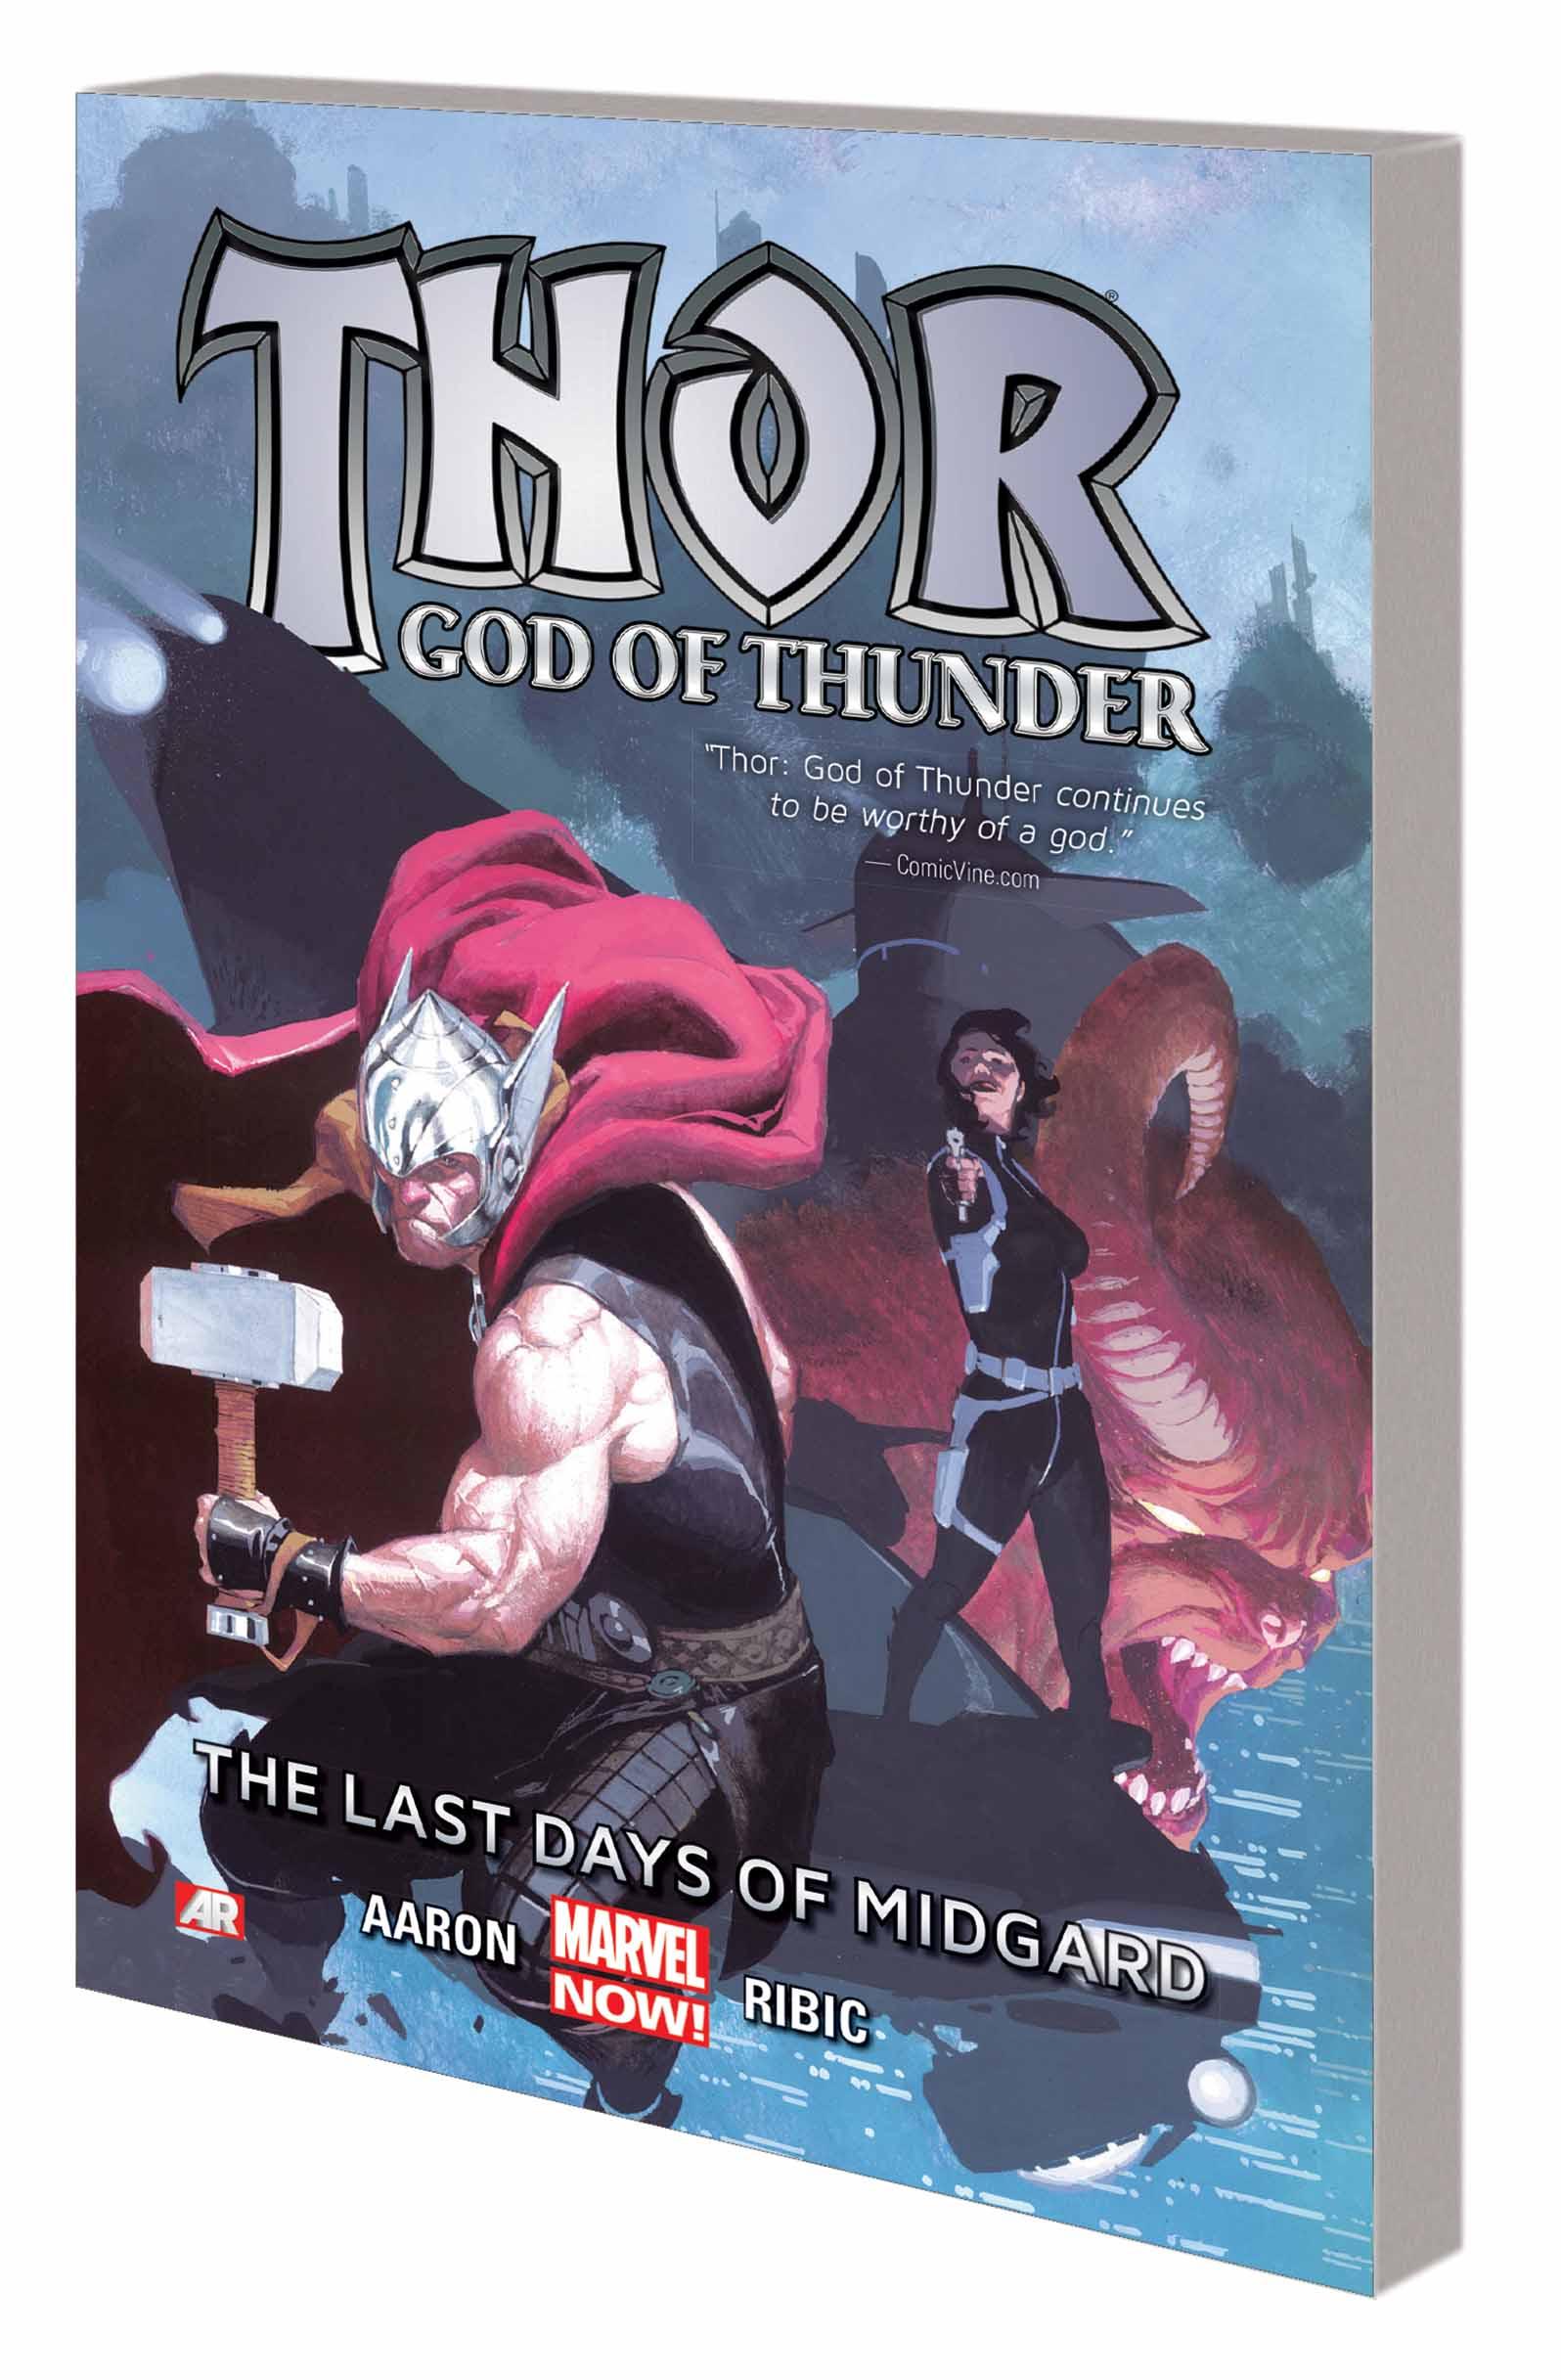 THOR: GOD OF THUNDER - THE LAST DAYS OF MIDGARD (Trade Paperback)